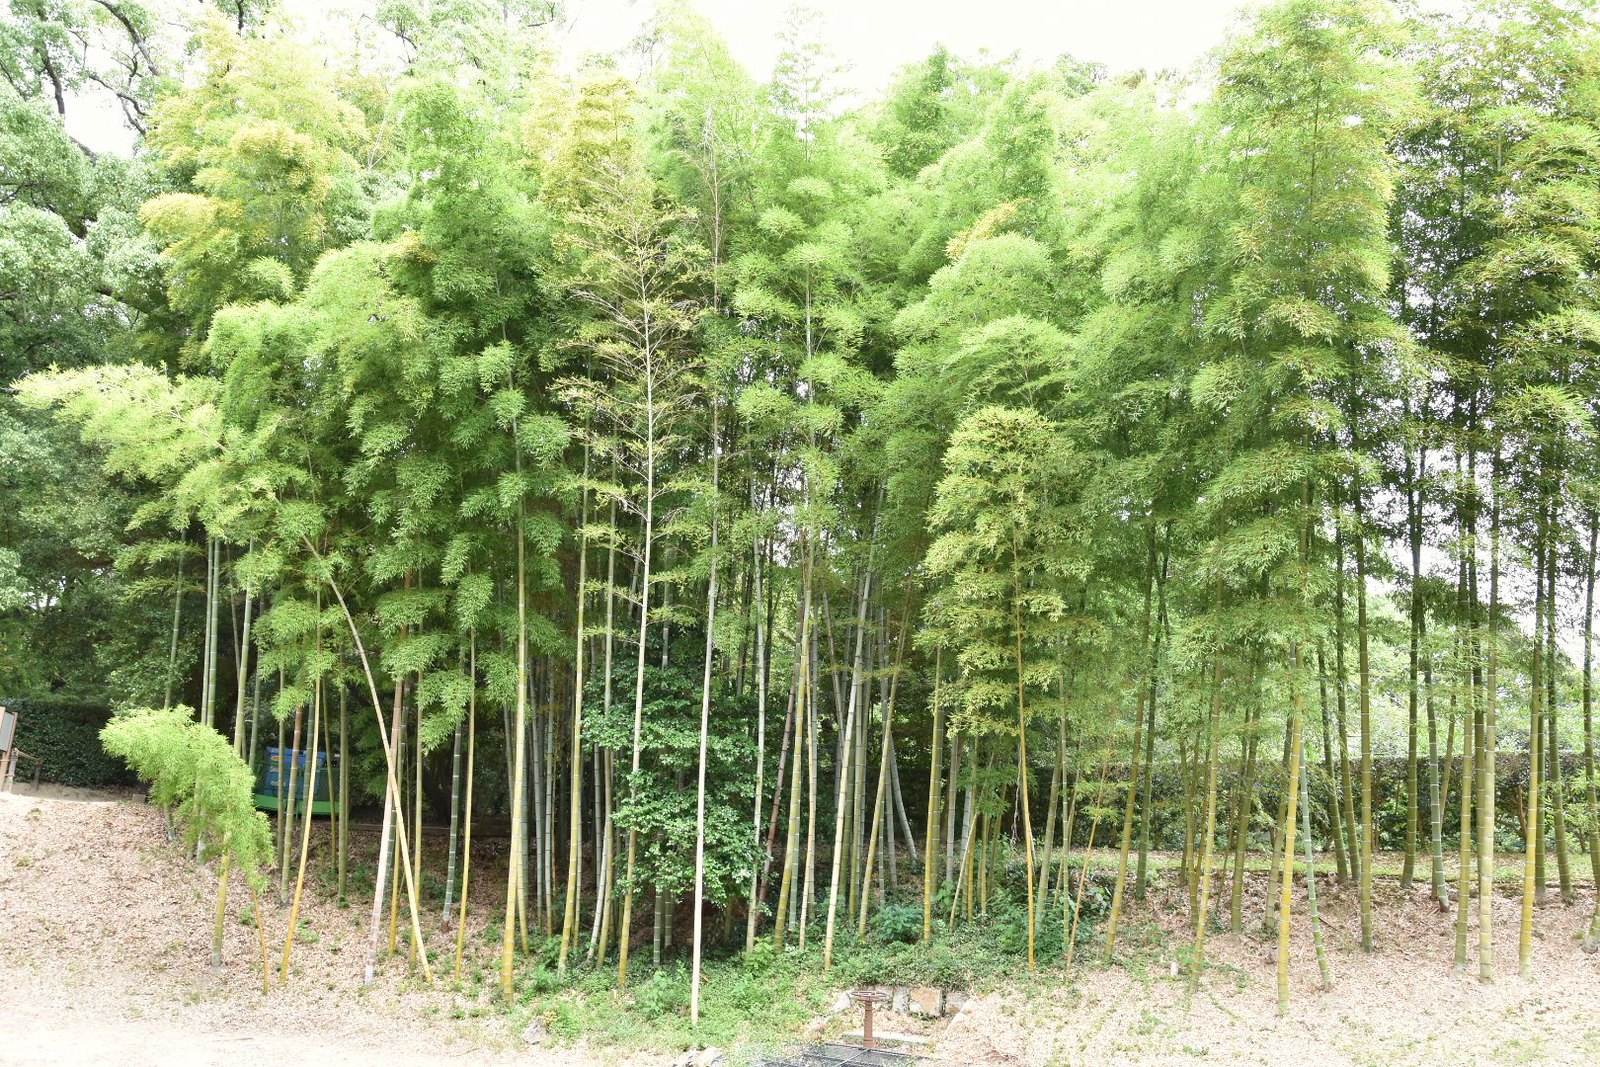 Jardins de Kôraku-en - bambous